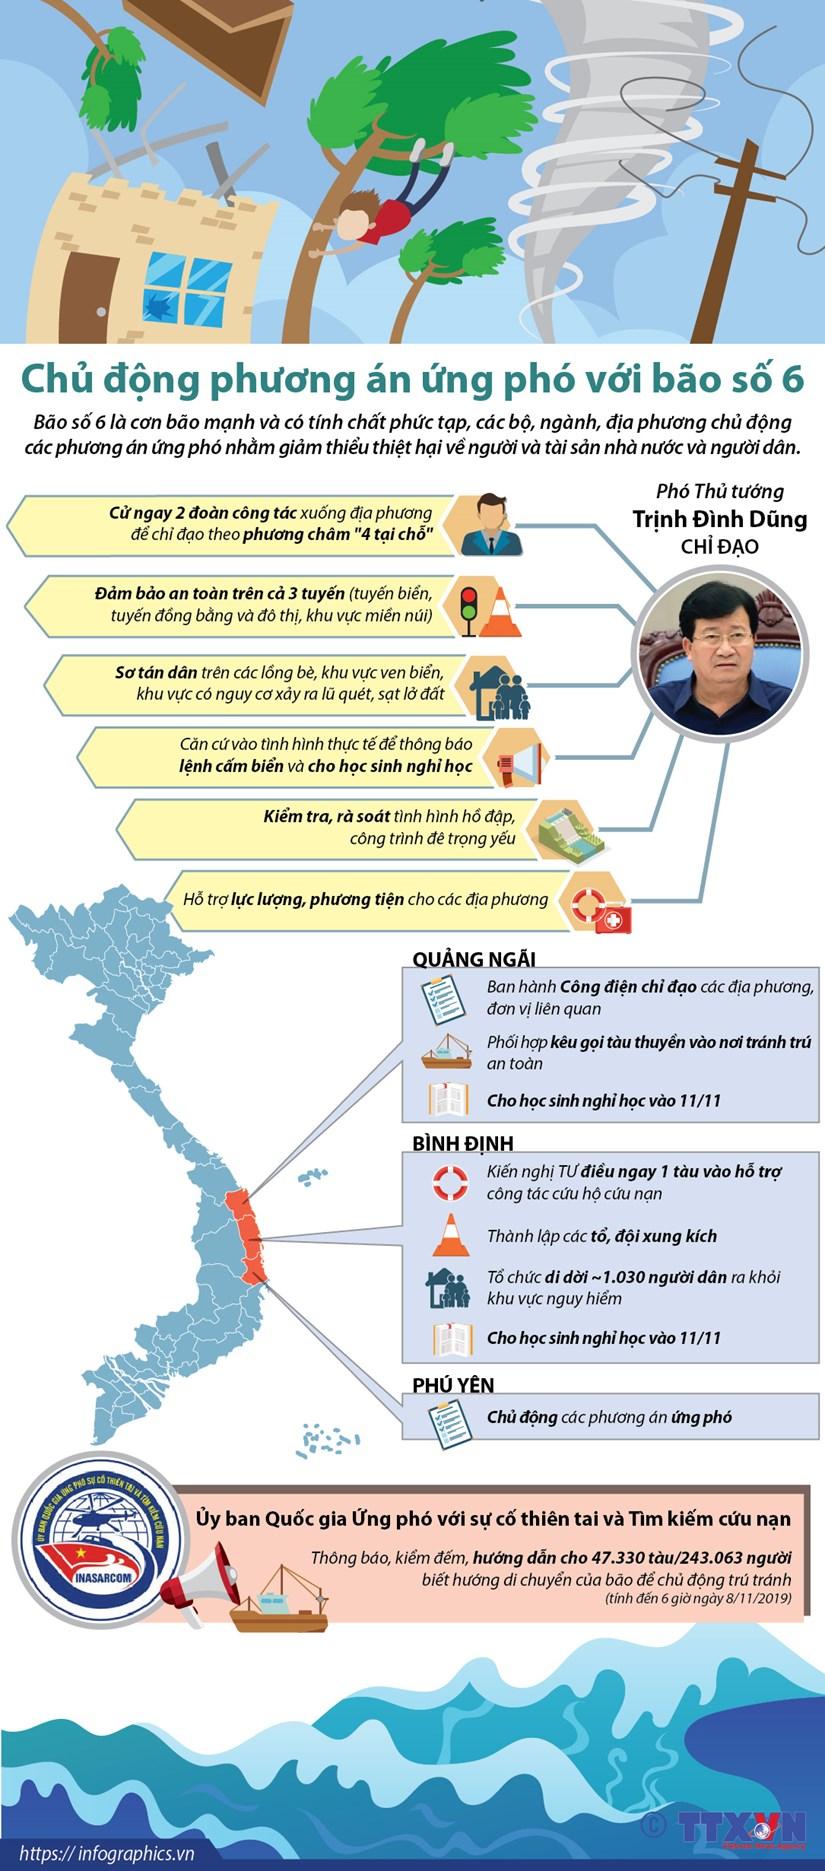 [Infographics] Chu dong phuong an ung pho voi bao so 6 hinh anh 1